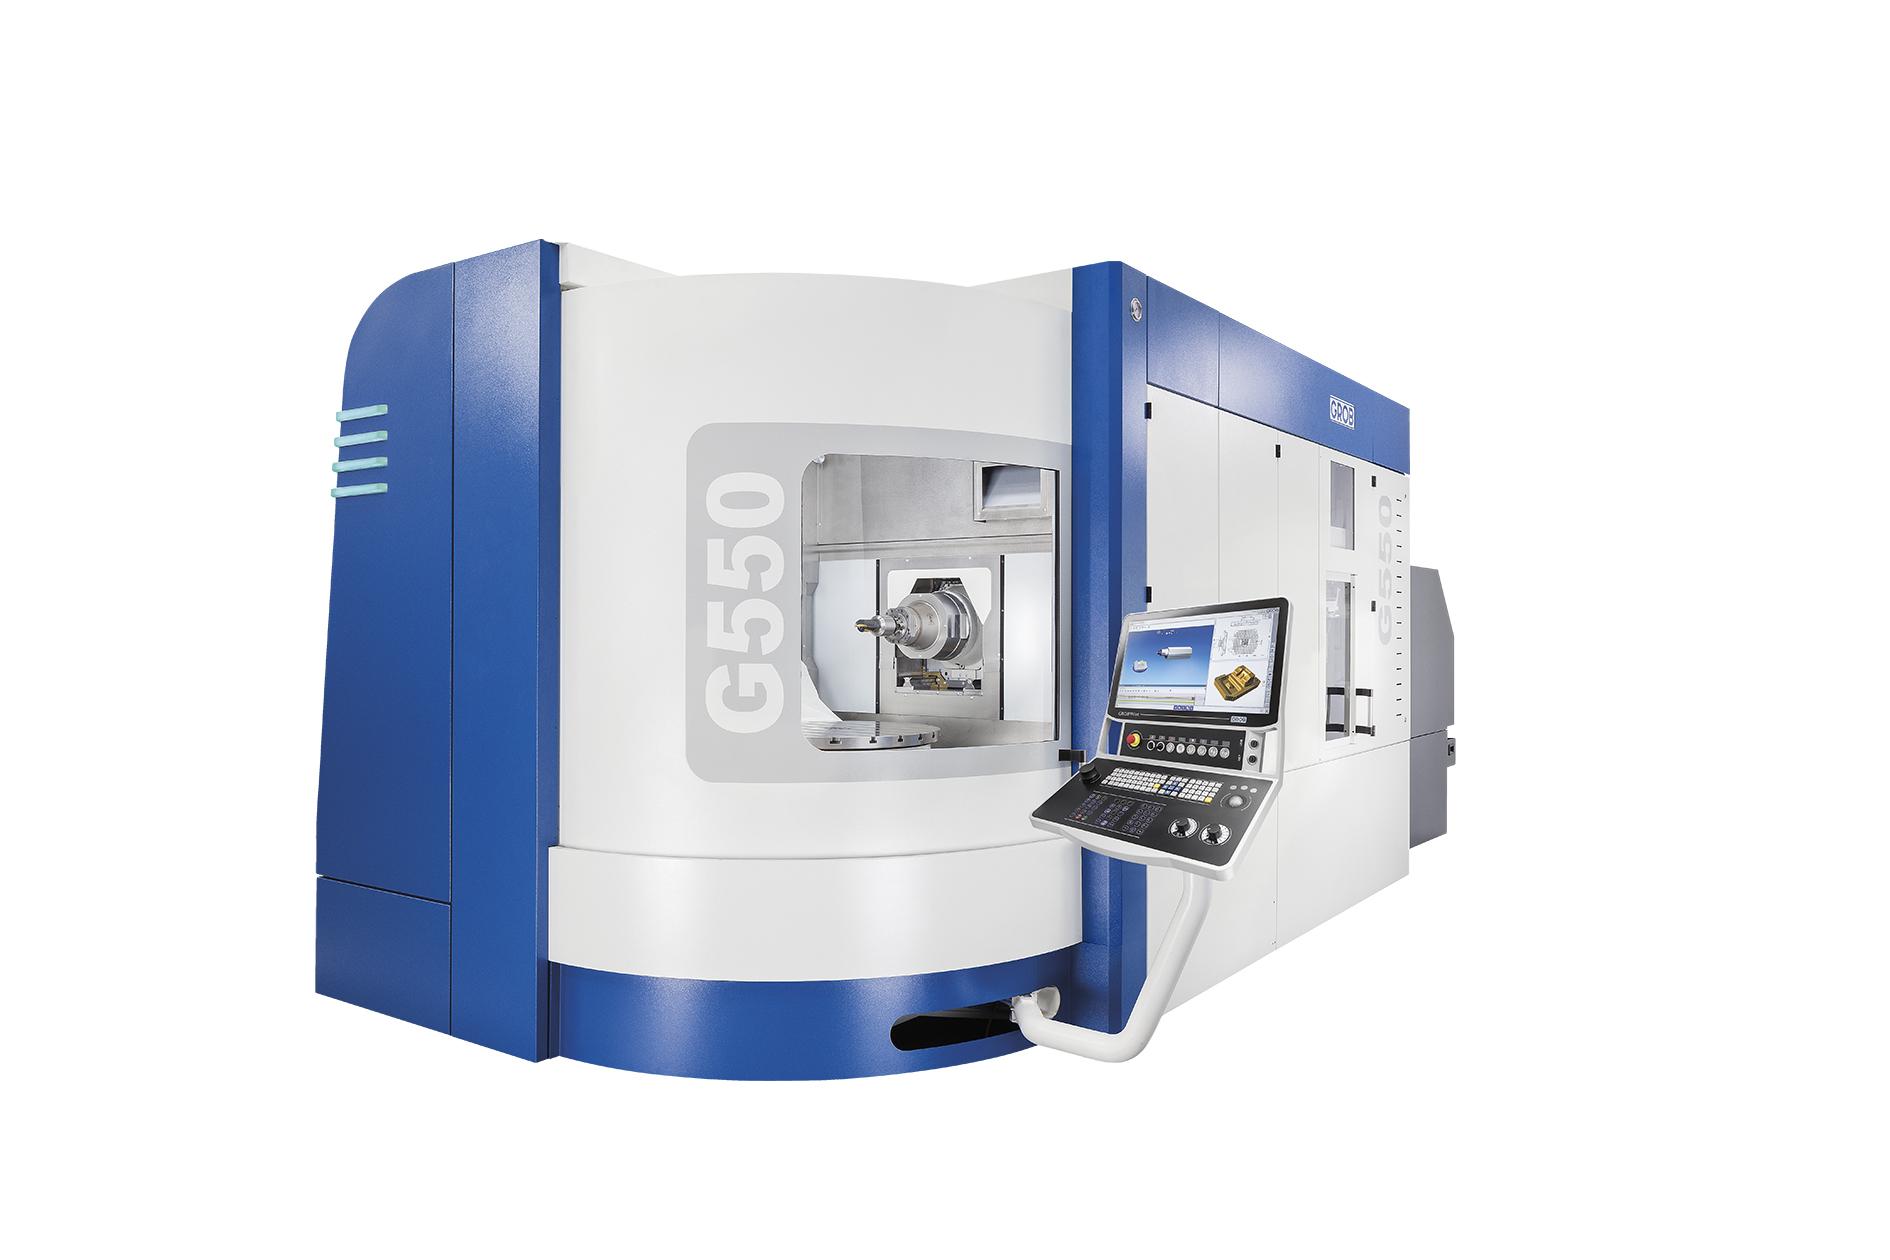 CNC-Fräsmaschine Grob G 552, x=800 y=1020 z=970, 30000 1/min   ohne Palettenspeicher Span-tec